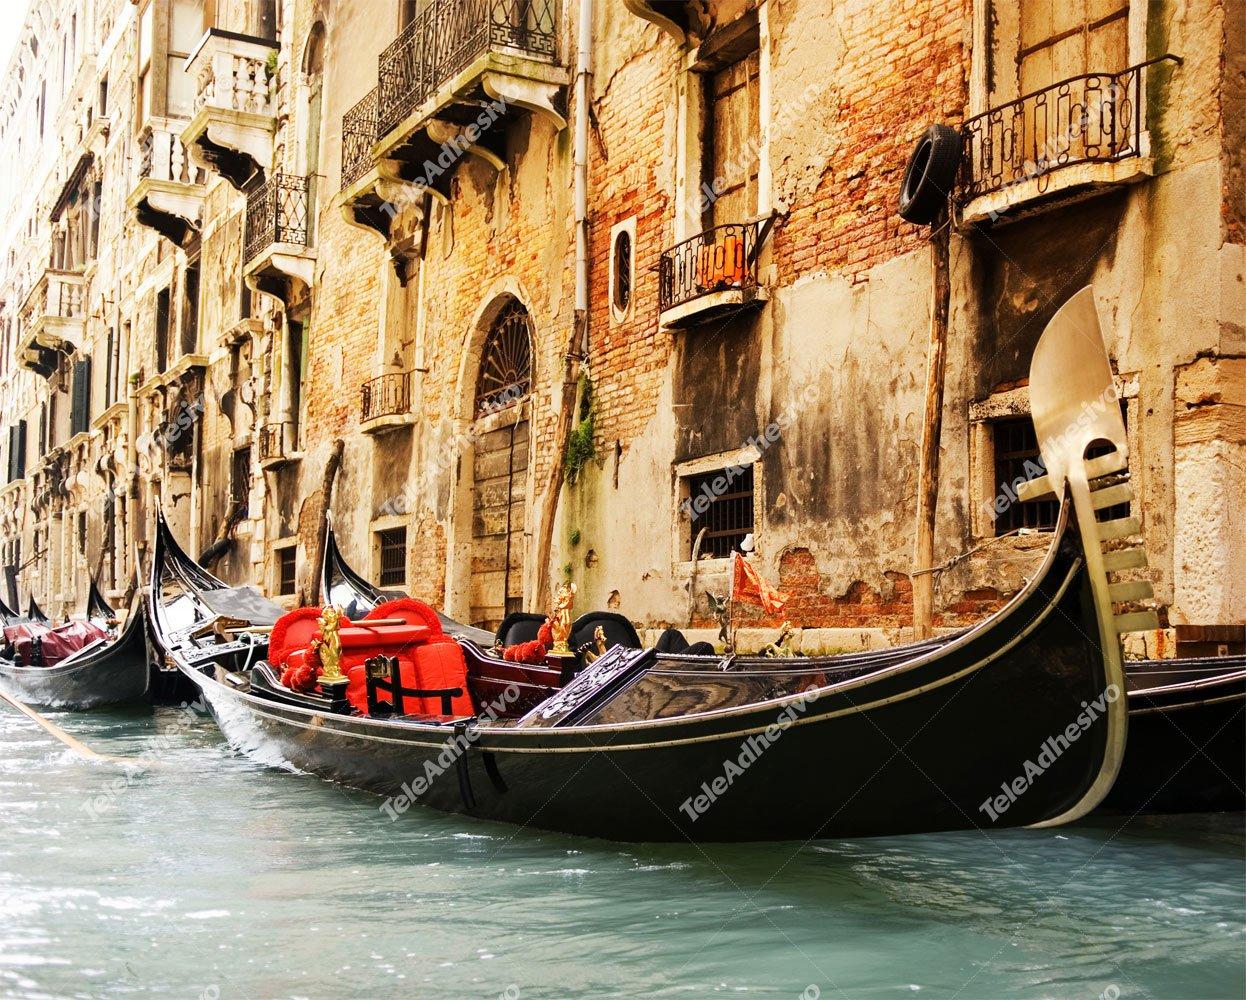 Fototapeten: Venedig Gondel